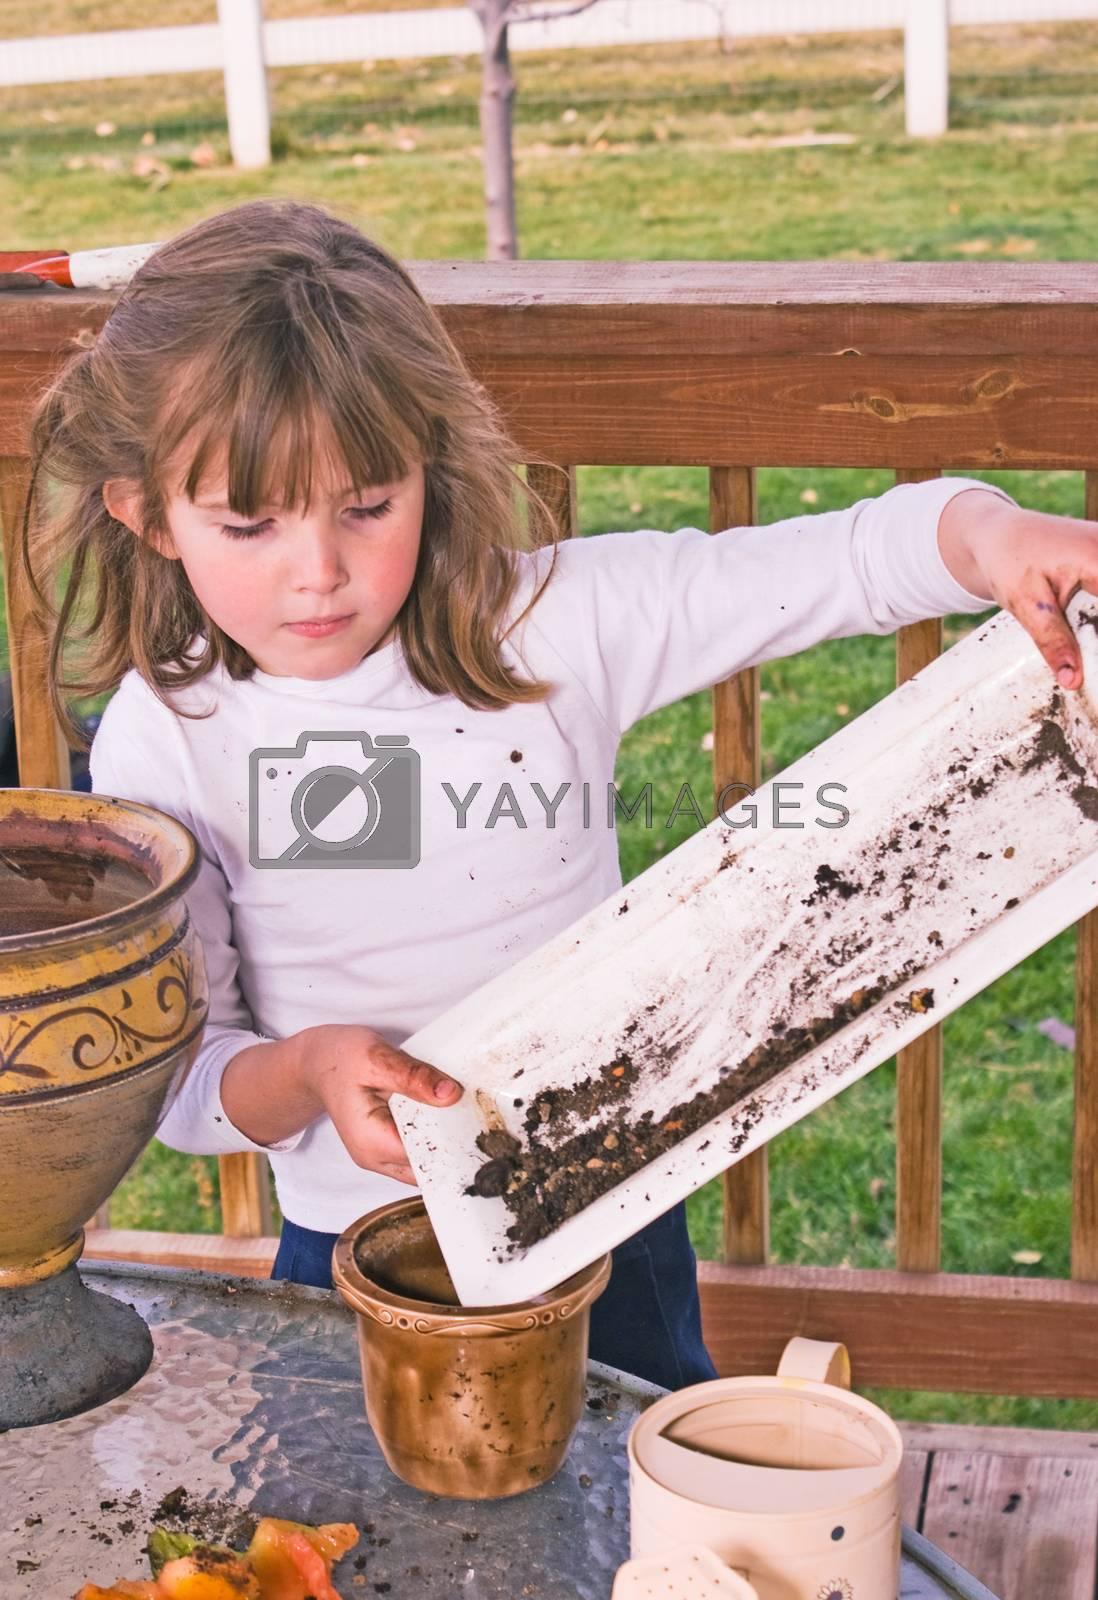 Little girl helping grandma replant new flowers.